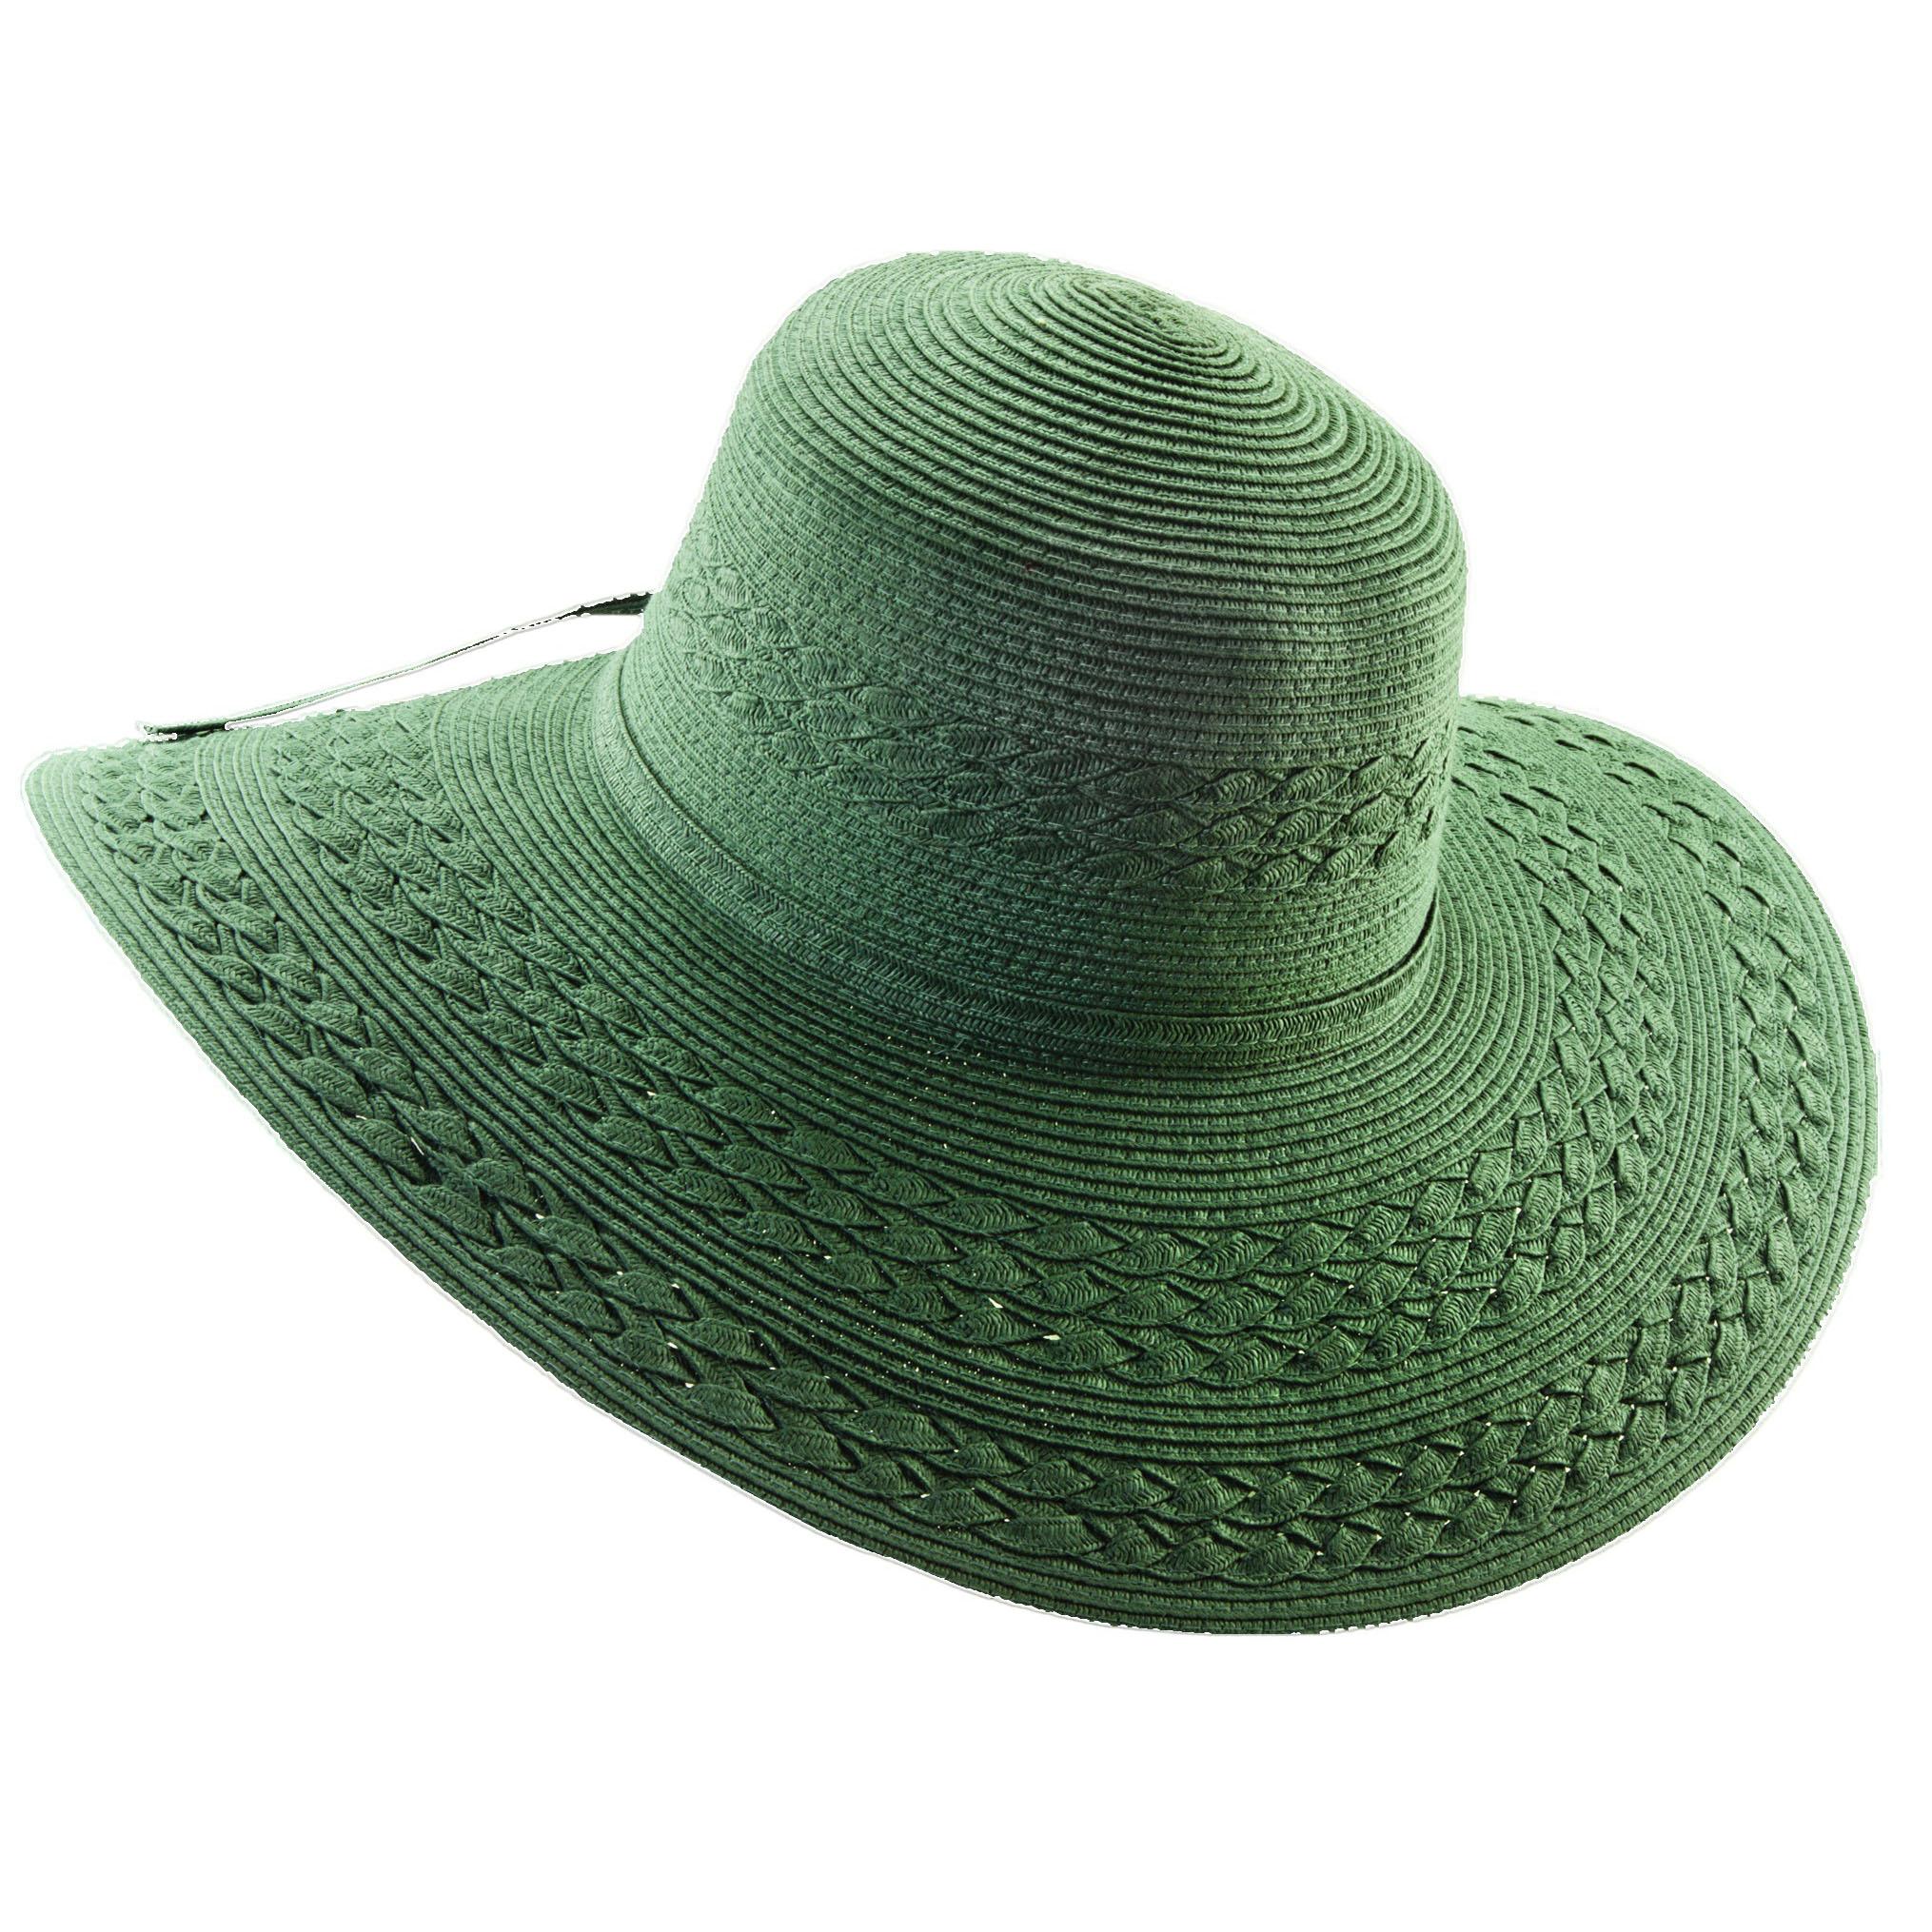 how to clean striaghten a paper sun hat